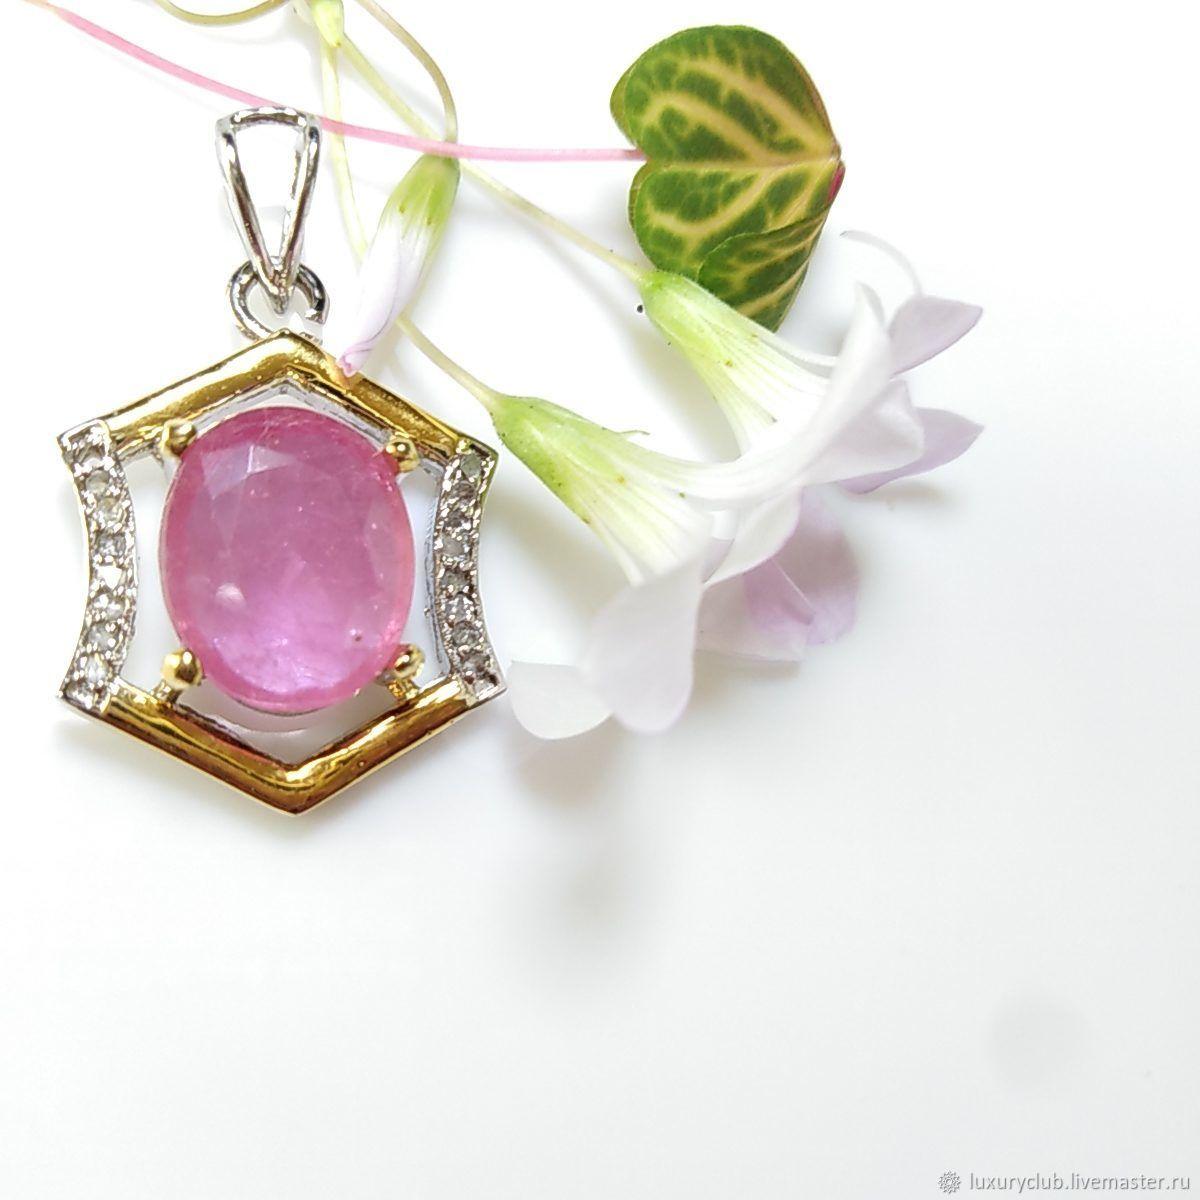 Chain necklace 'Asmik' diamonds ruby buy, Pendants, Tolyatti,  Фото №1